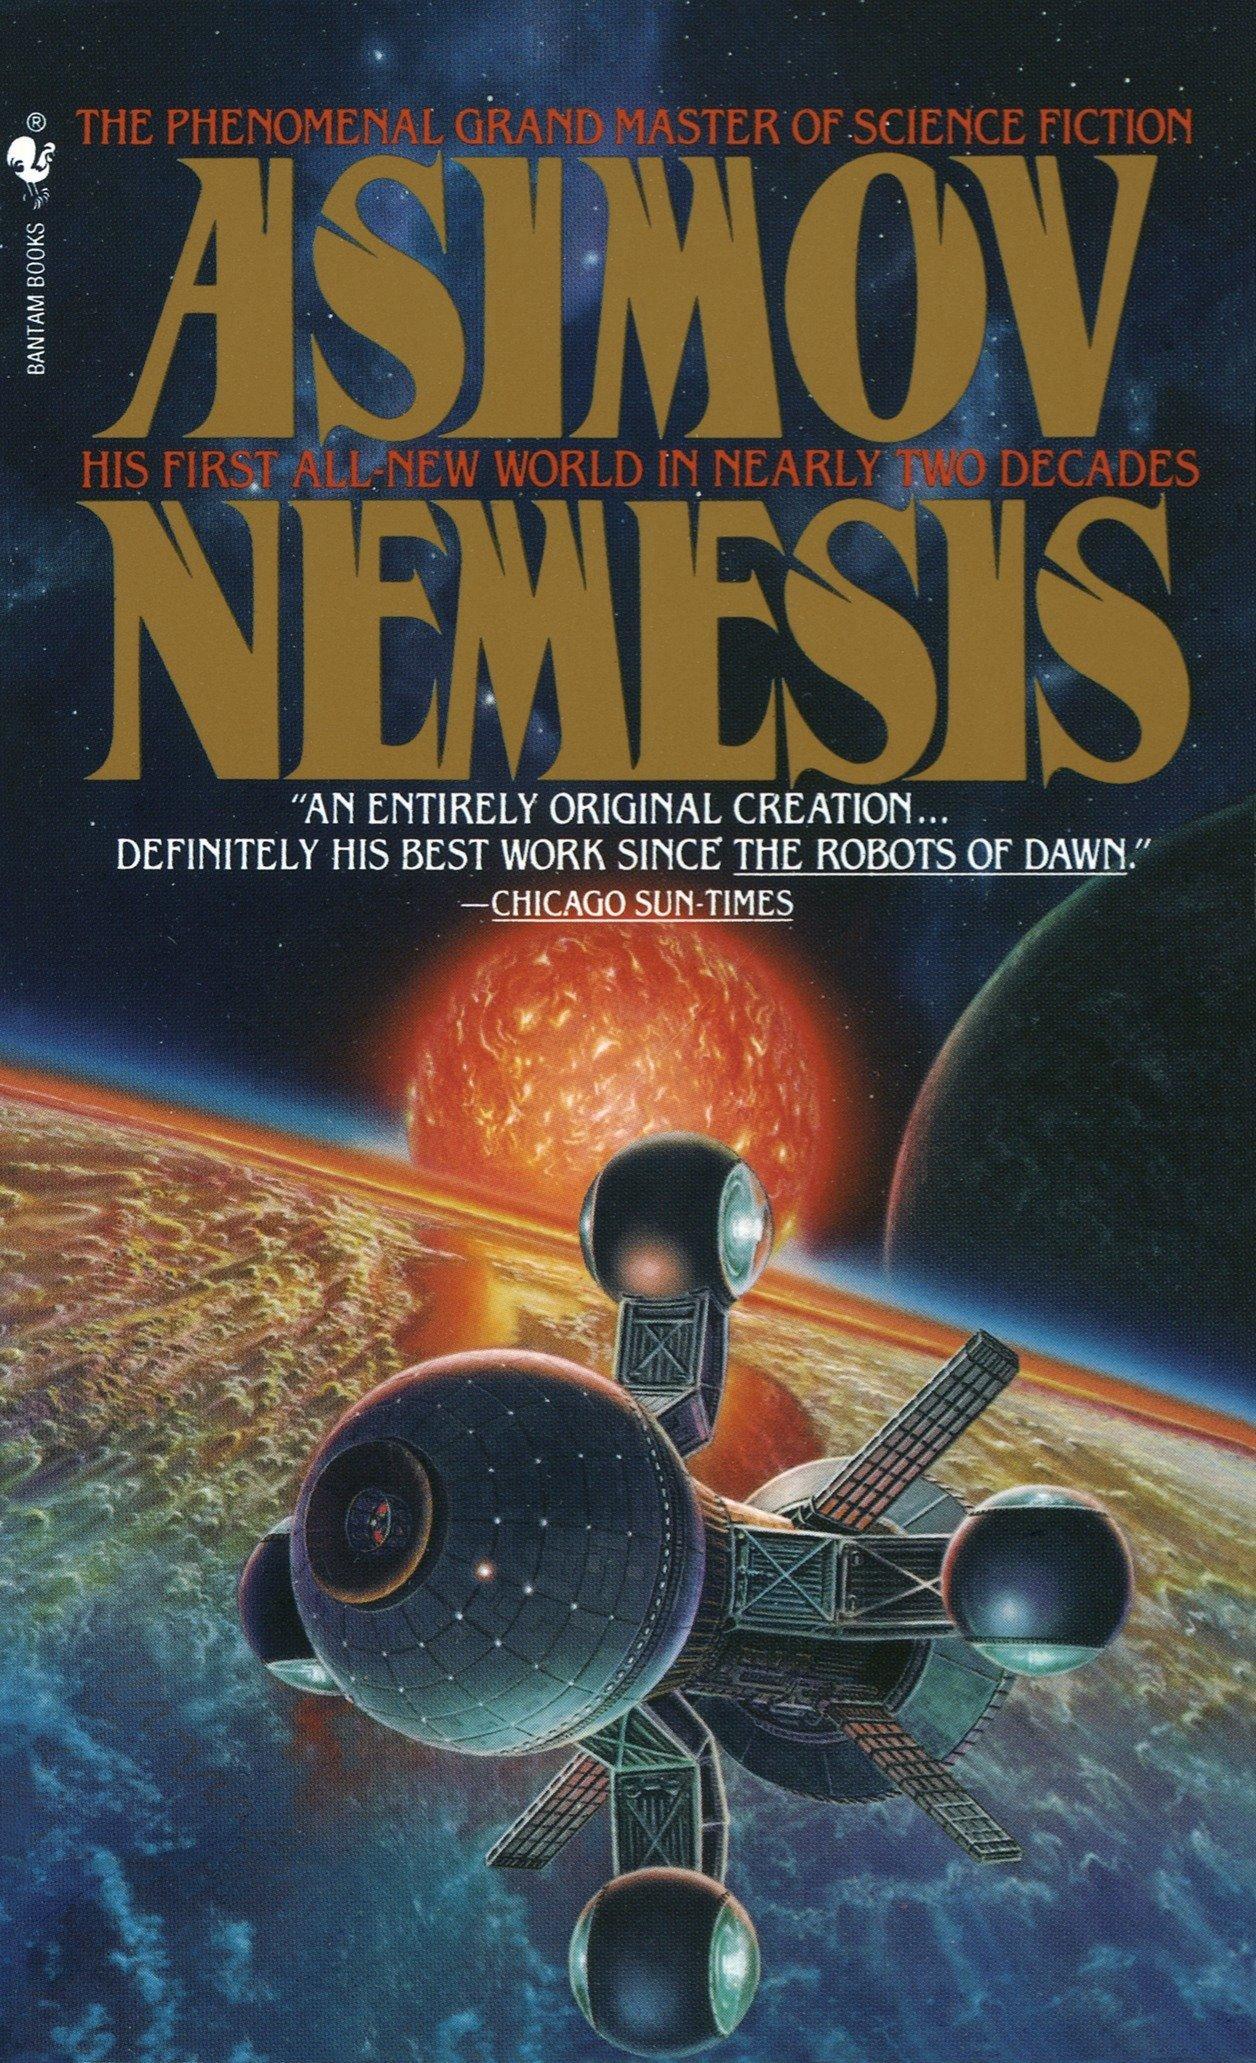 Nemesis [Idioma Inglés]: Amazon.es: Asimov, Isaac: Libros en idiomas extranjeros